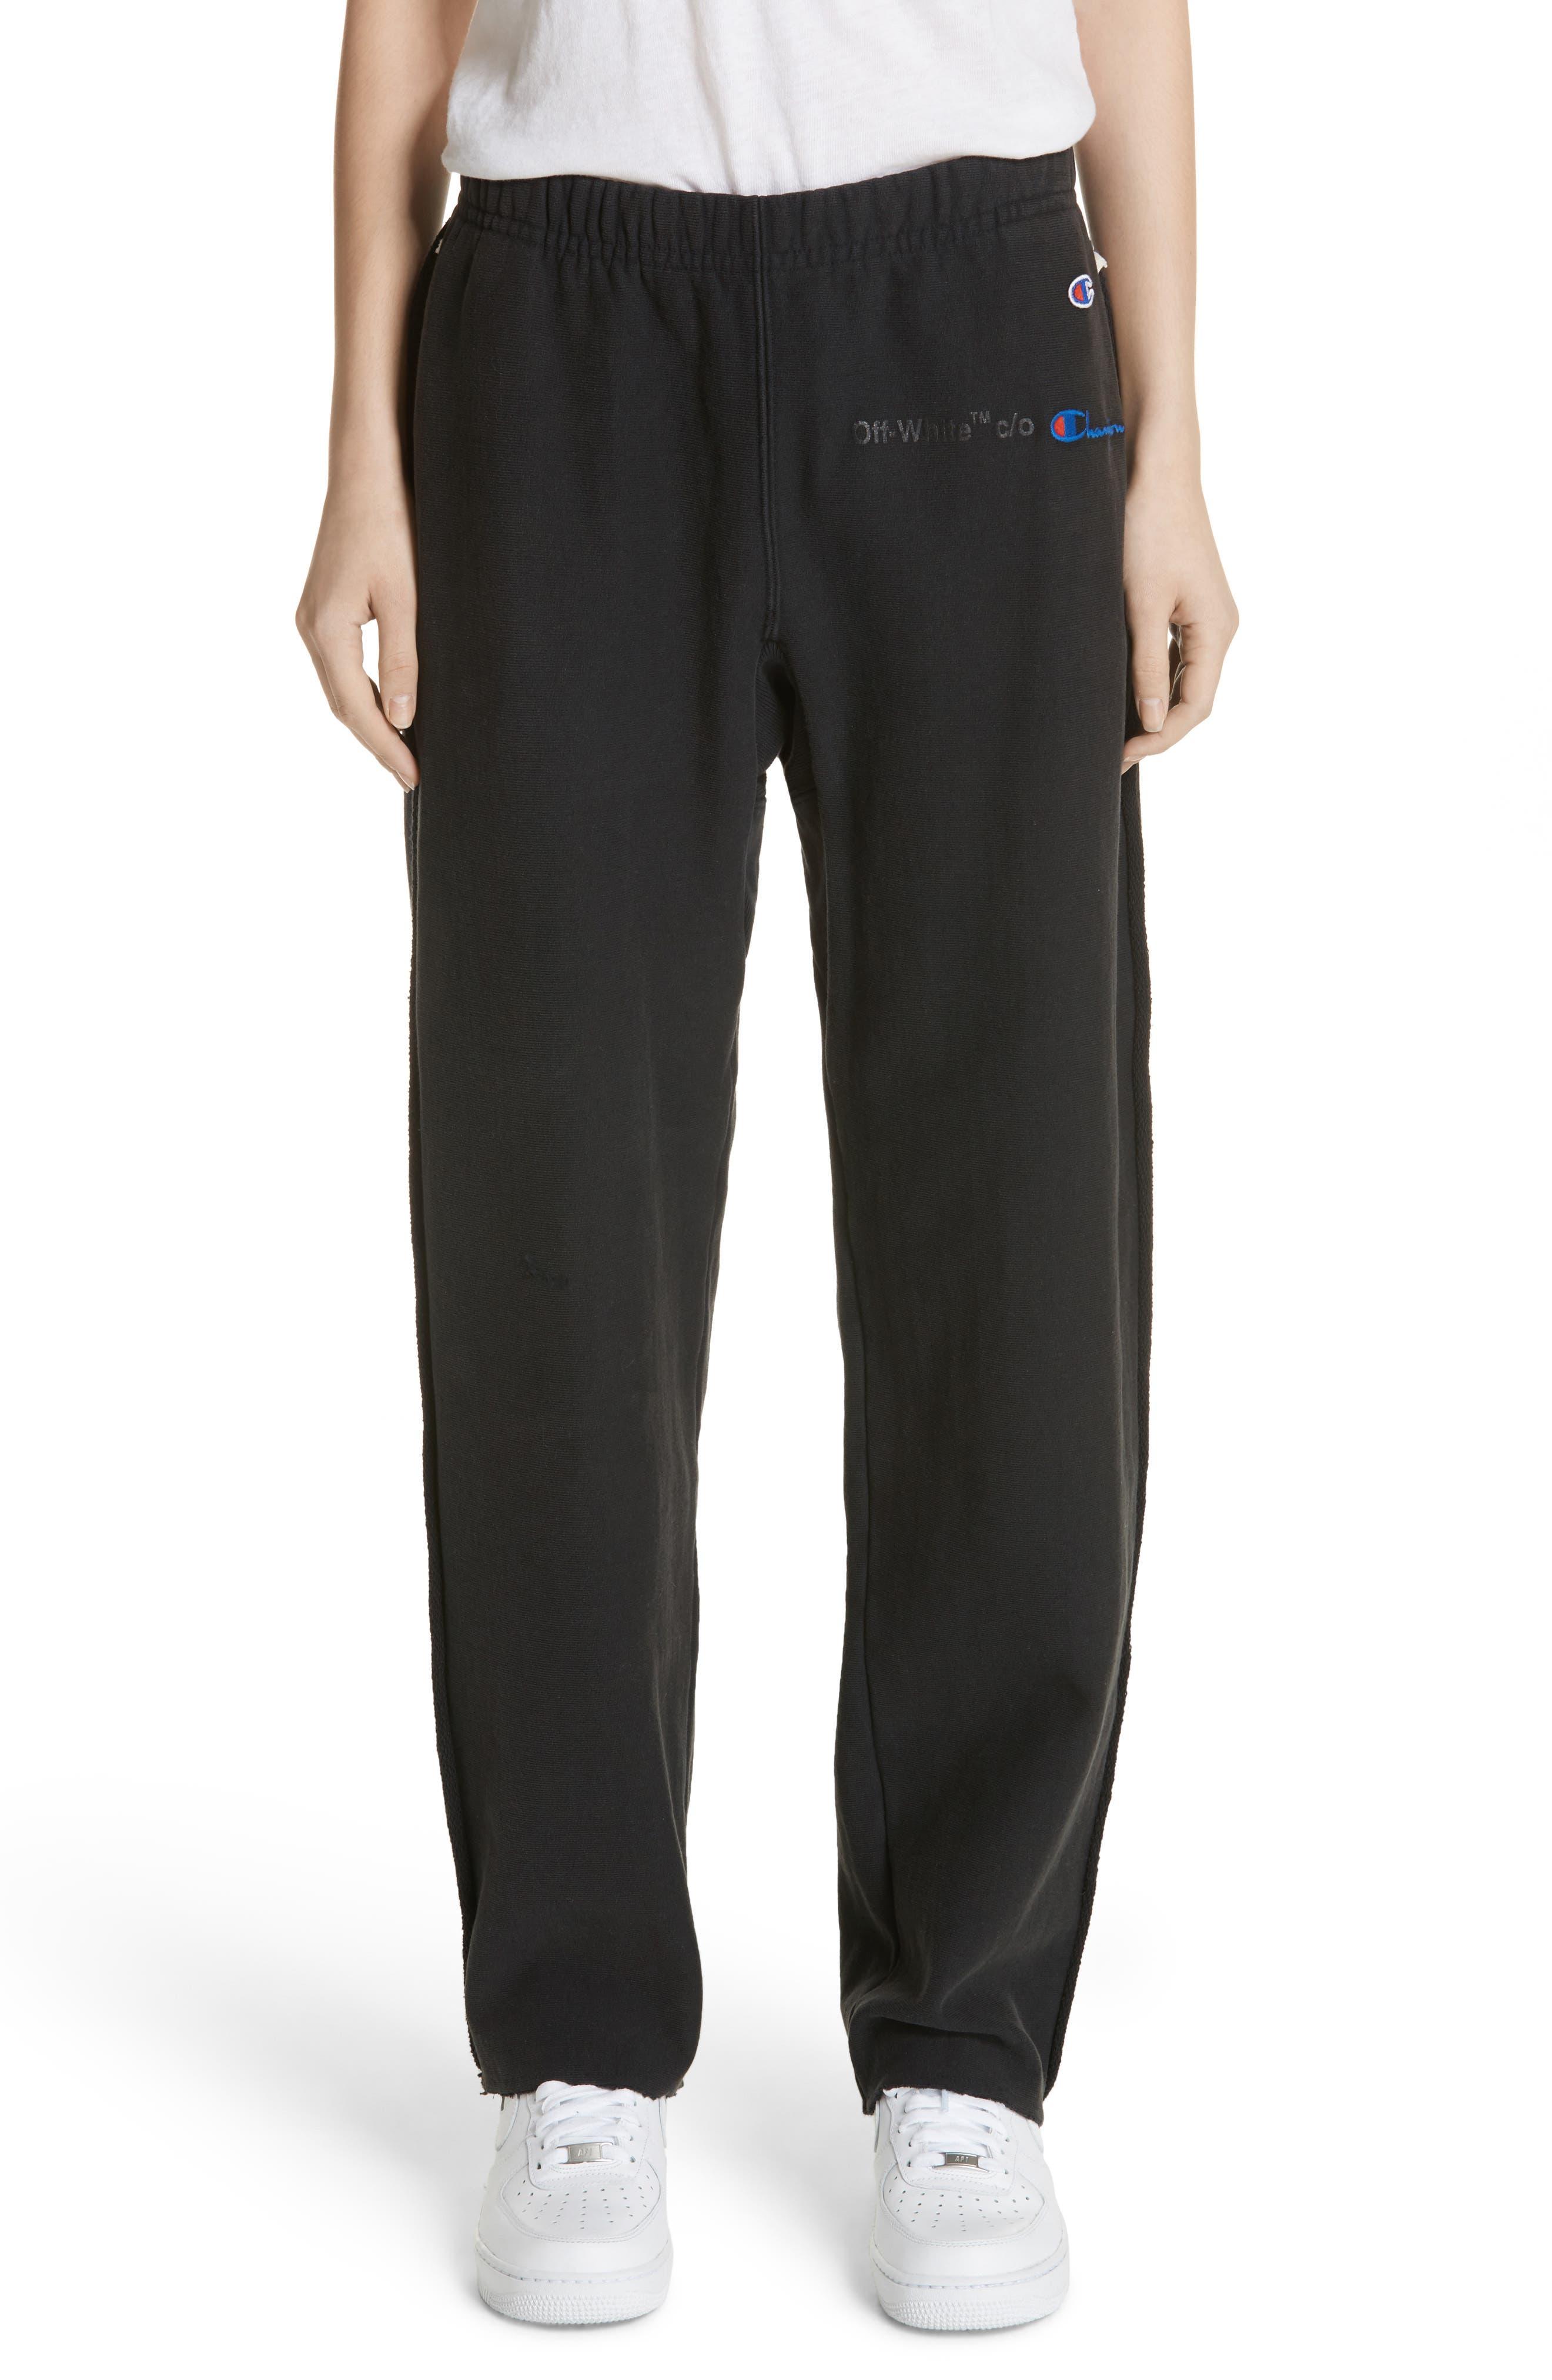 Main Image - Off-White x Champion Sweatpants